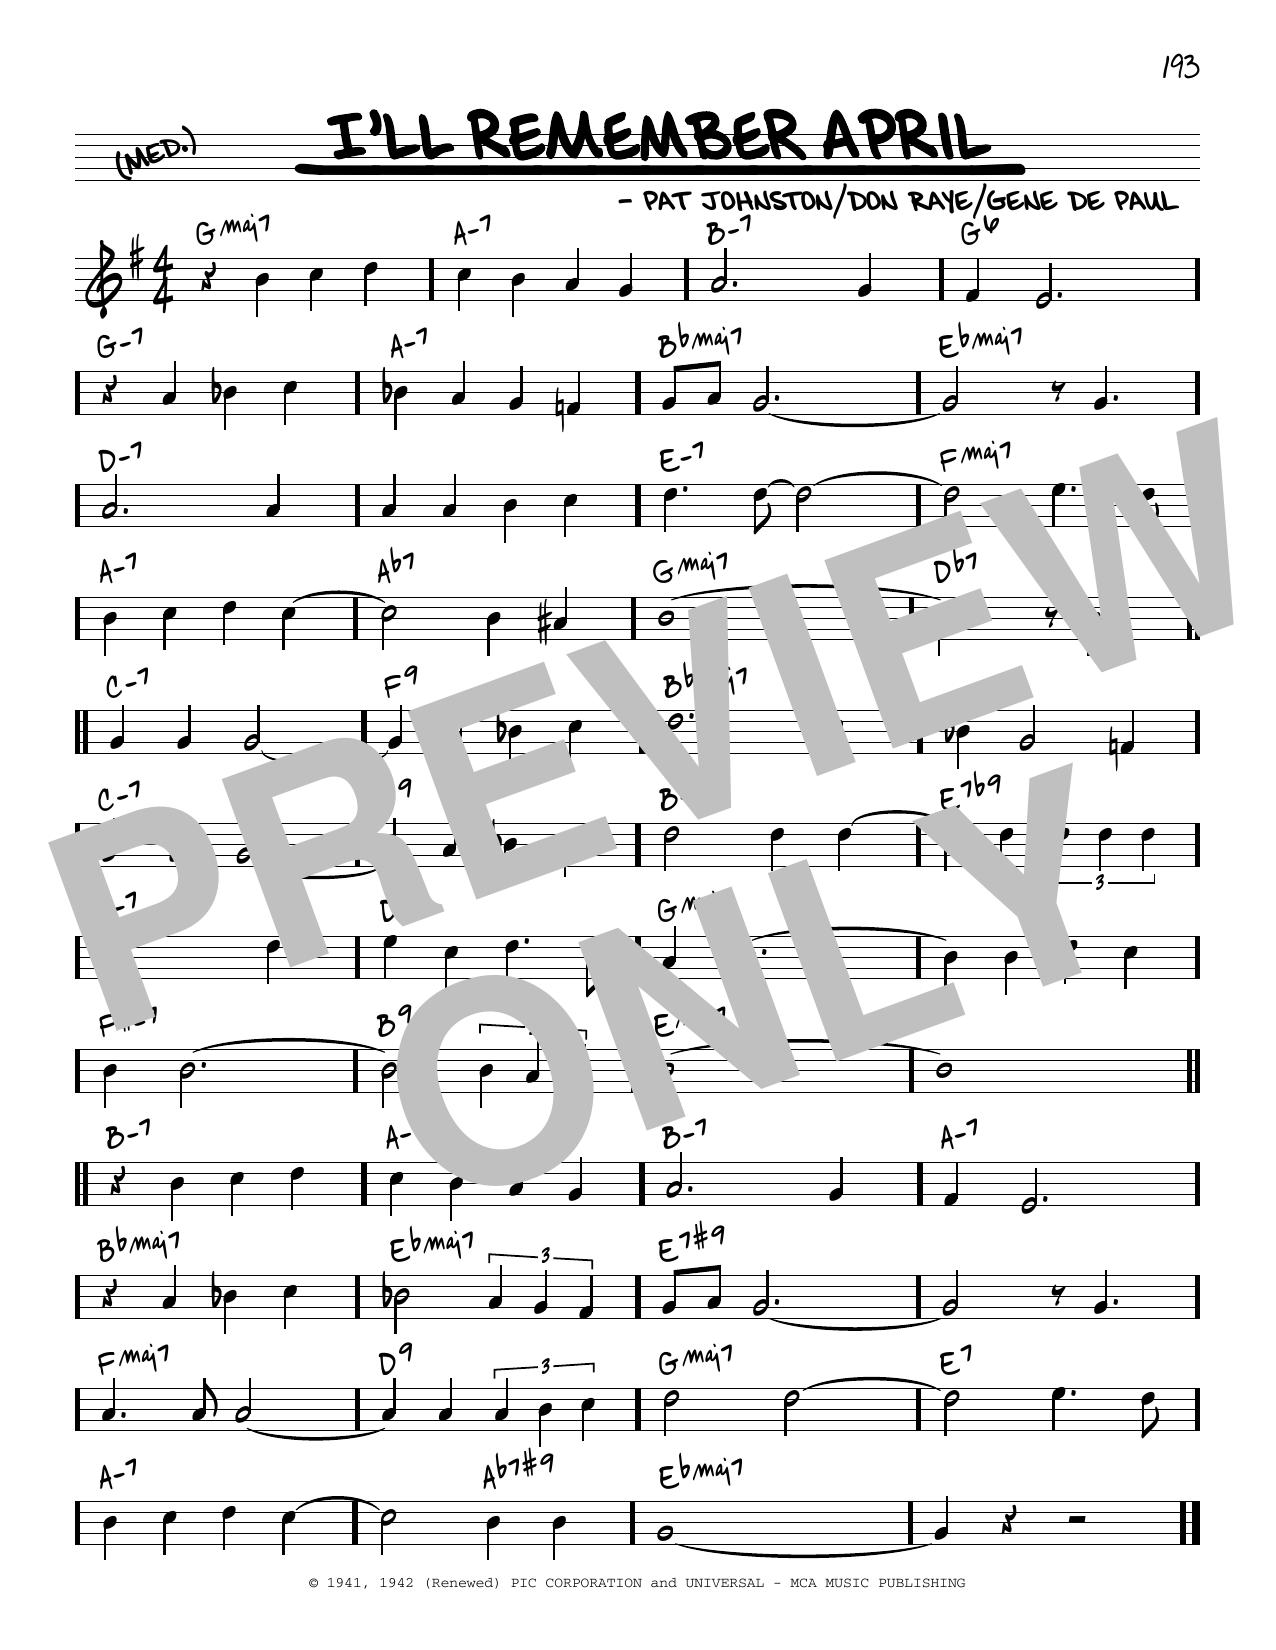 Woody Herman & His Orchestra I'll Remember April [Reharmonized version] (arr. Jack Grassel) sheet music notes printable PDF score